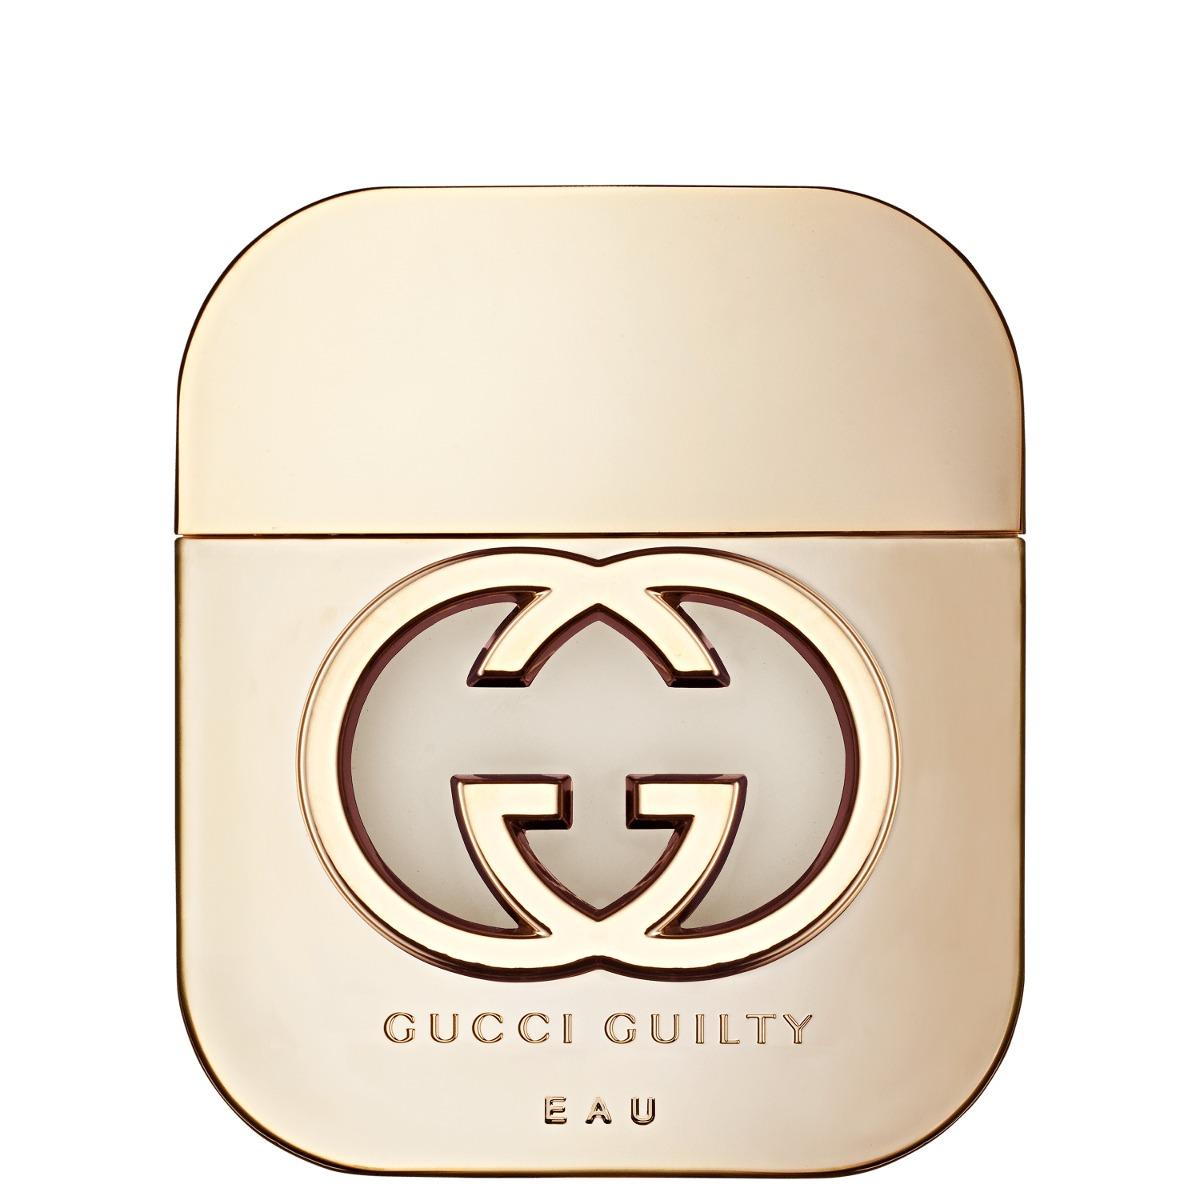 062ec0f01f4 gucci guilty eau eau de toilette perfume feminino 50ml blz. Carregando zoom.